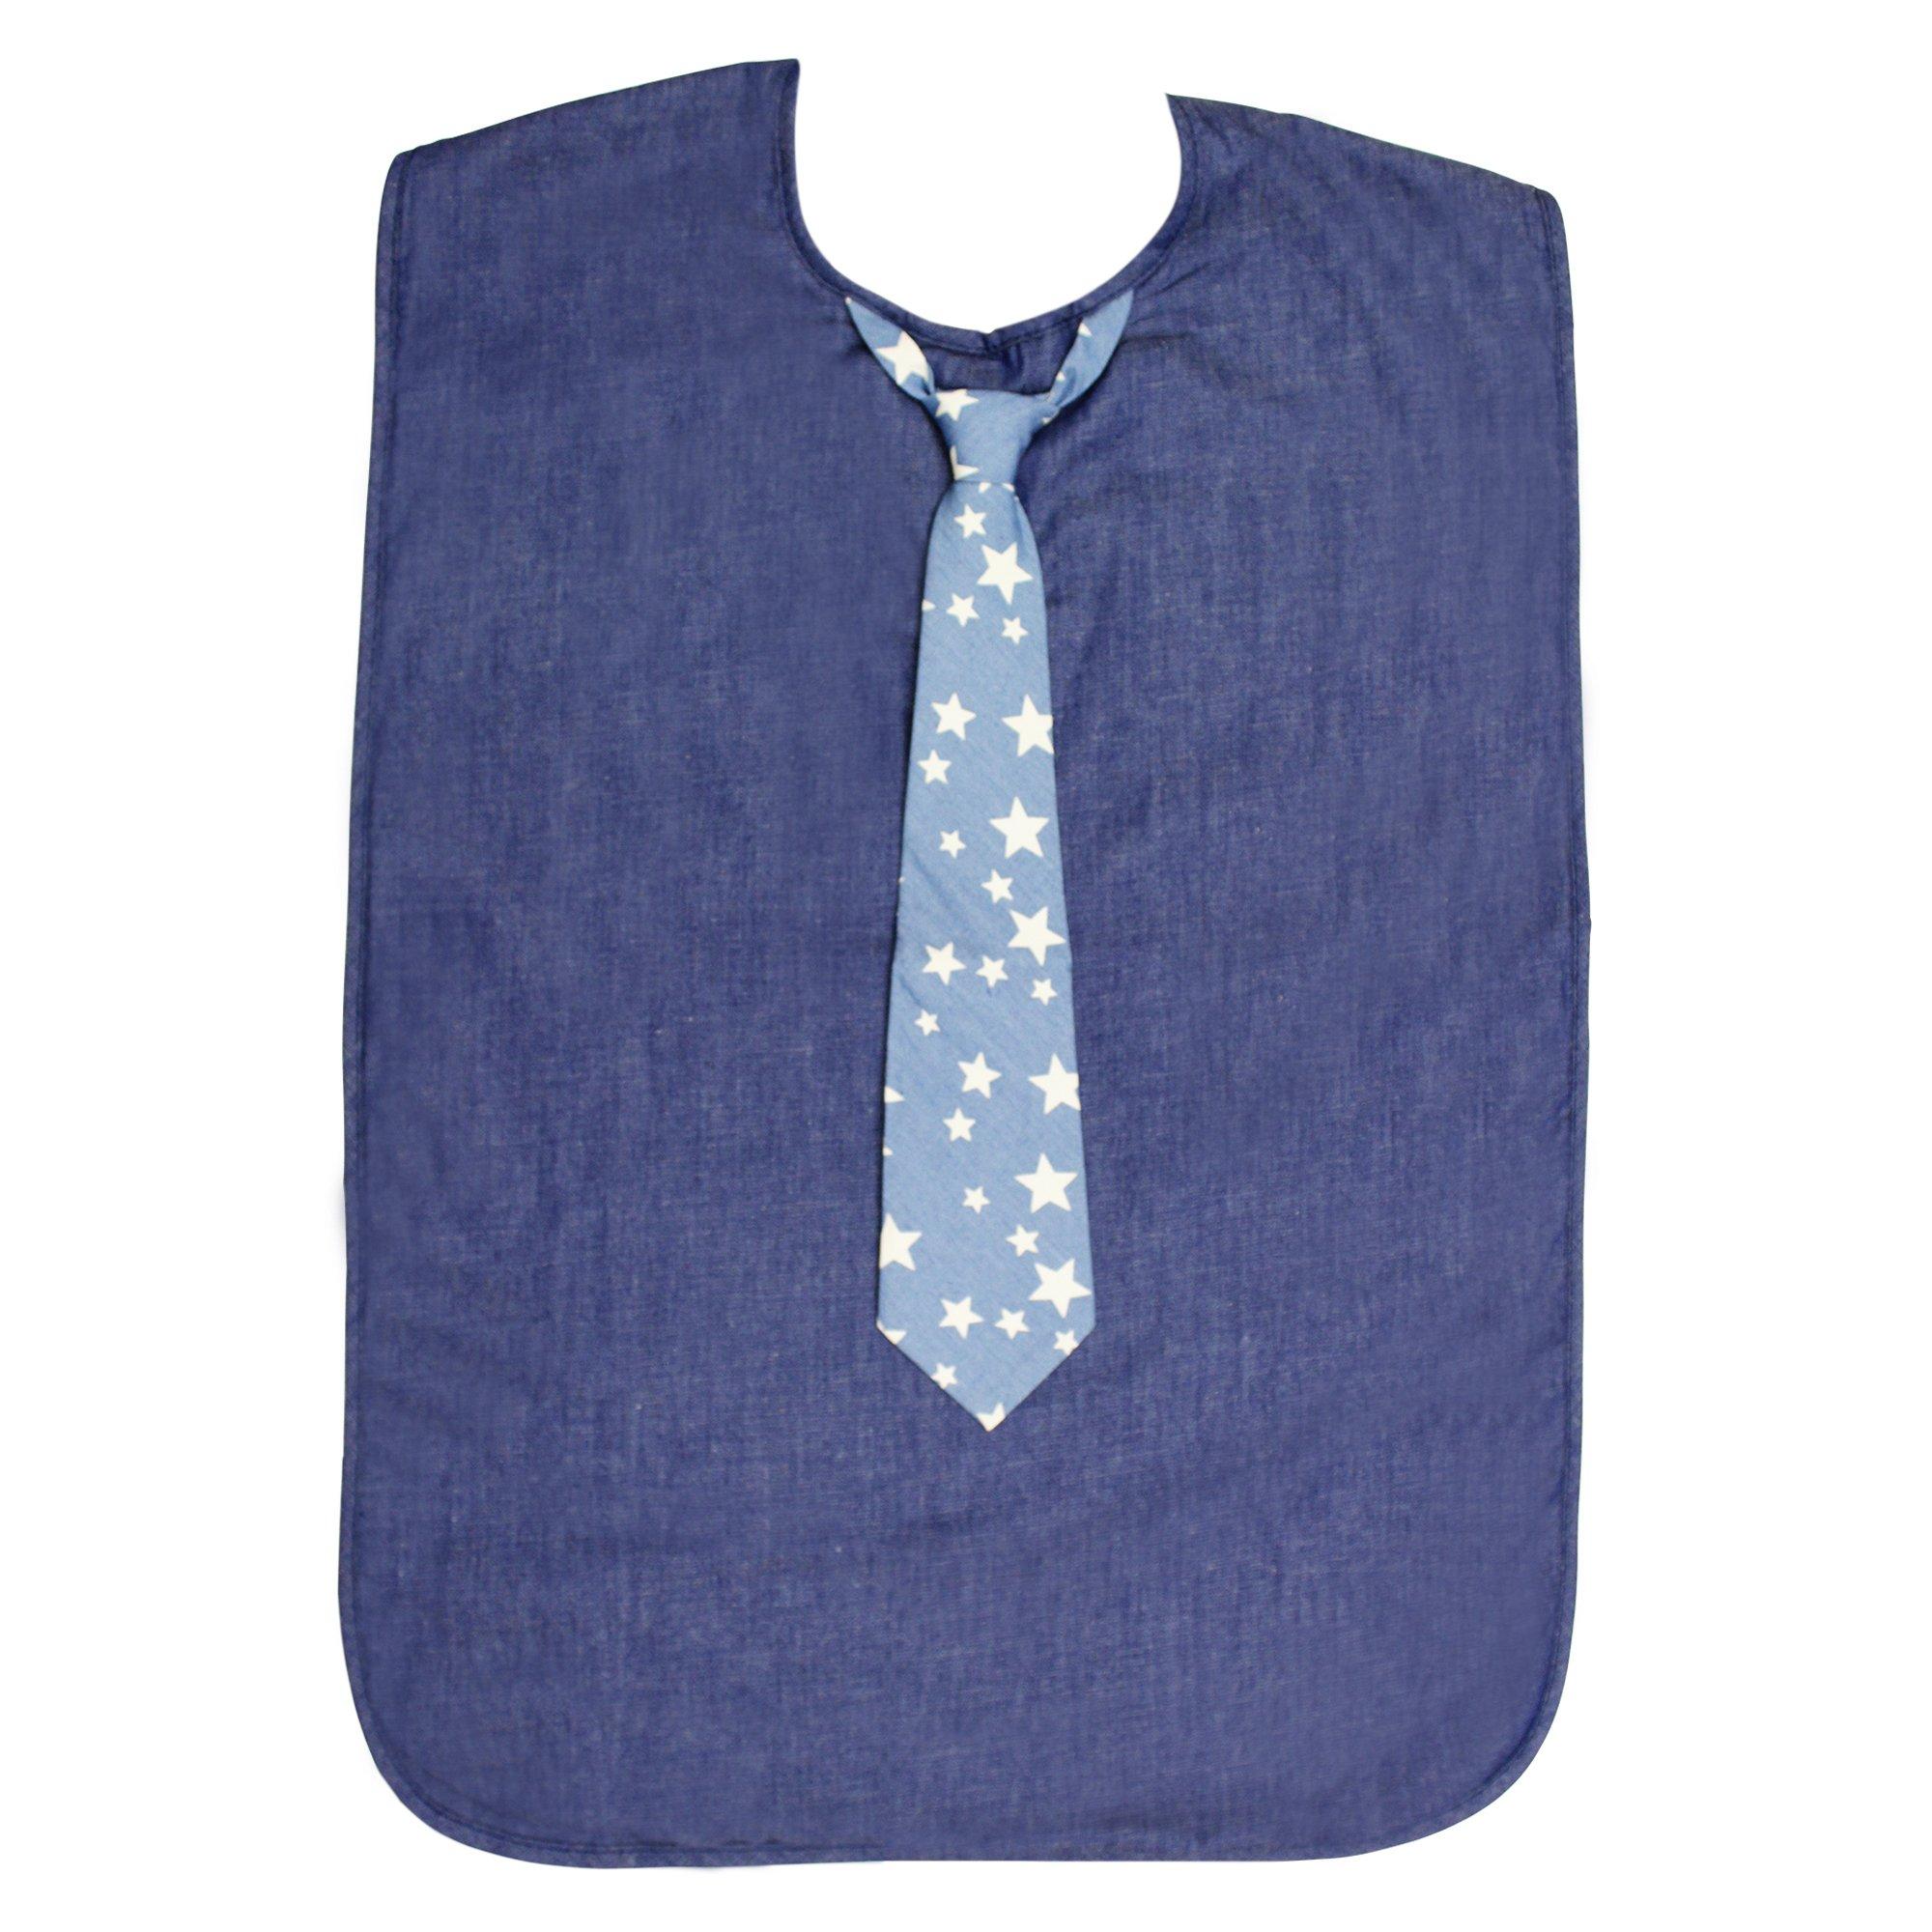 Men's Adult Bib, Chambray Bib with Blue Tie w/White Stars, Frenchie Mini Couture